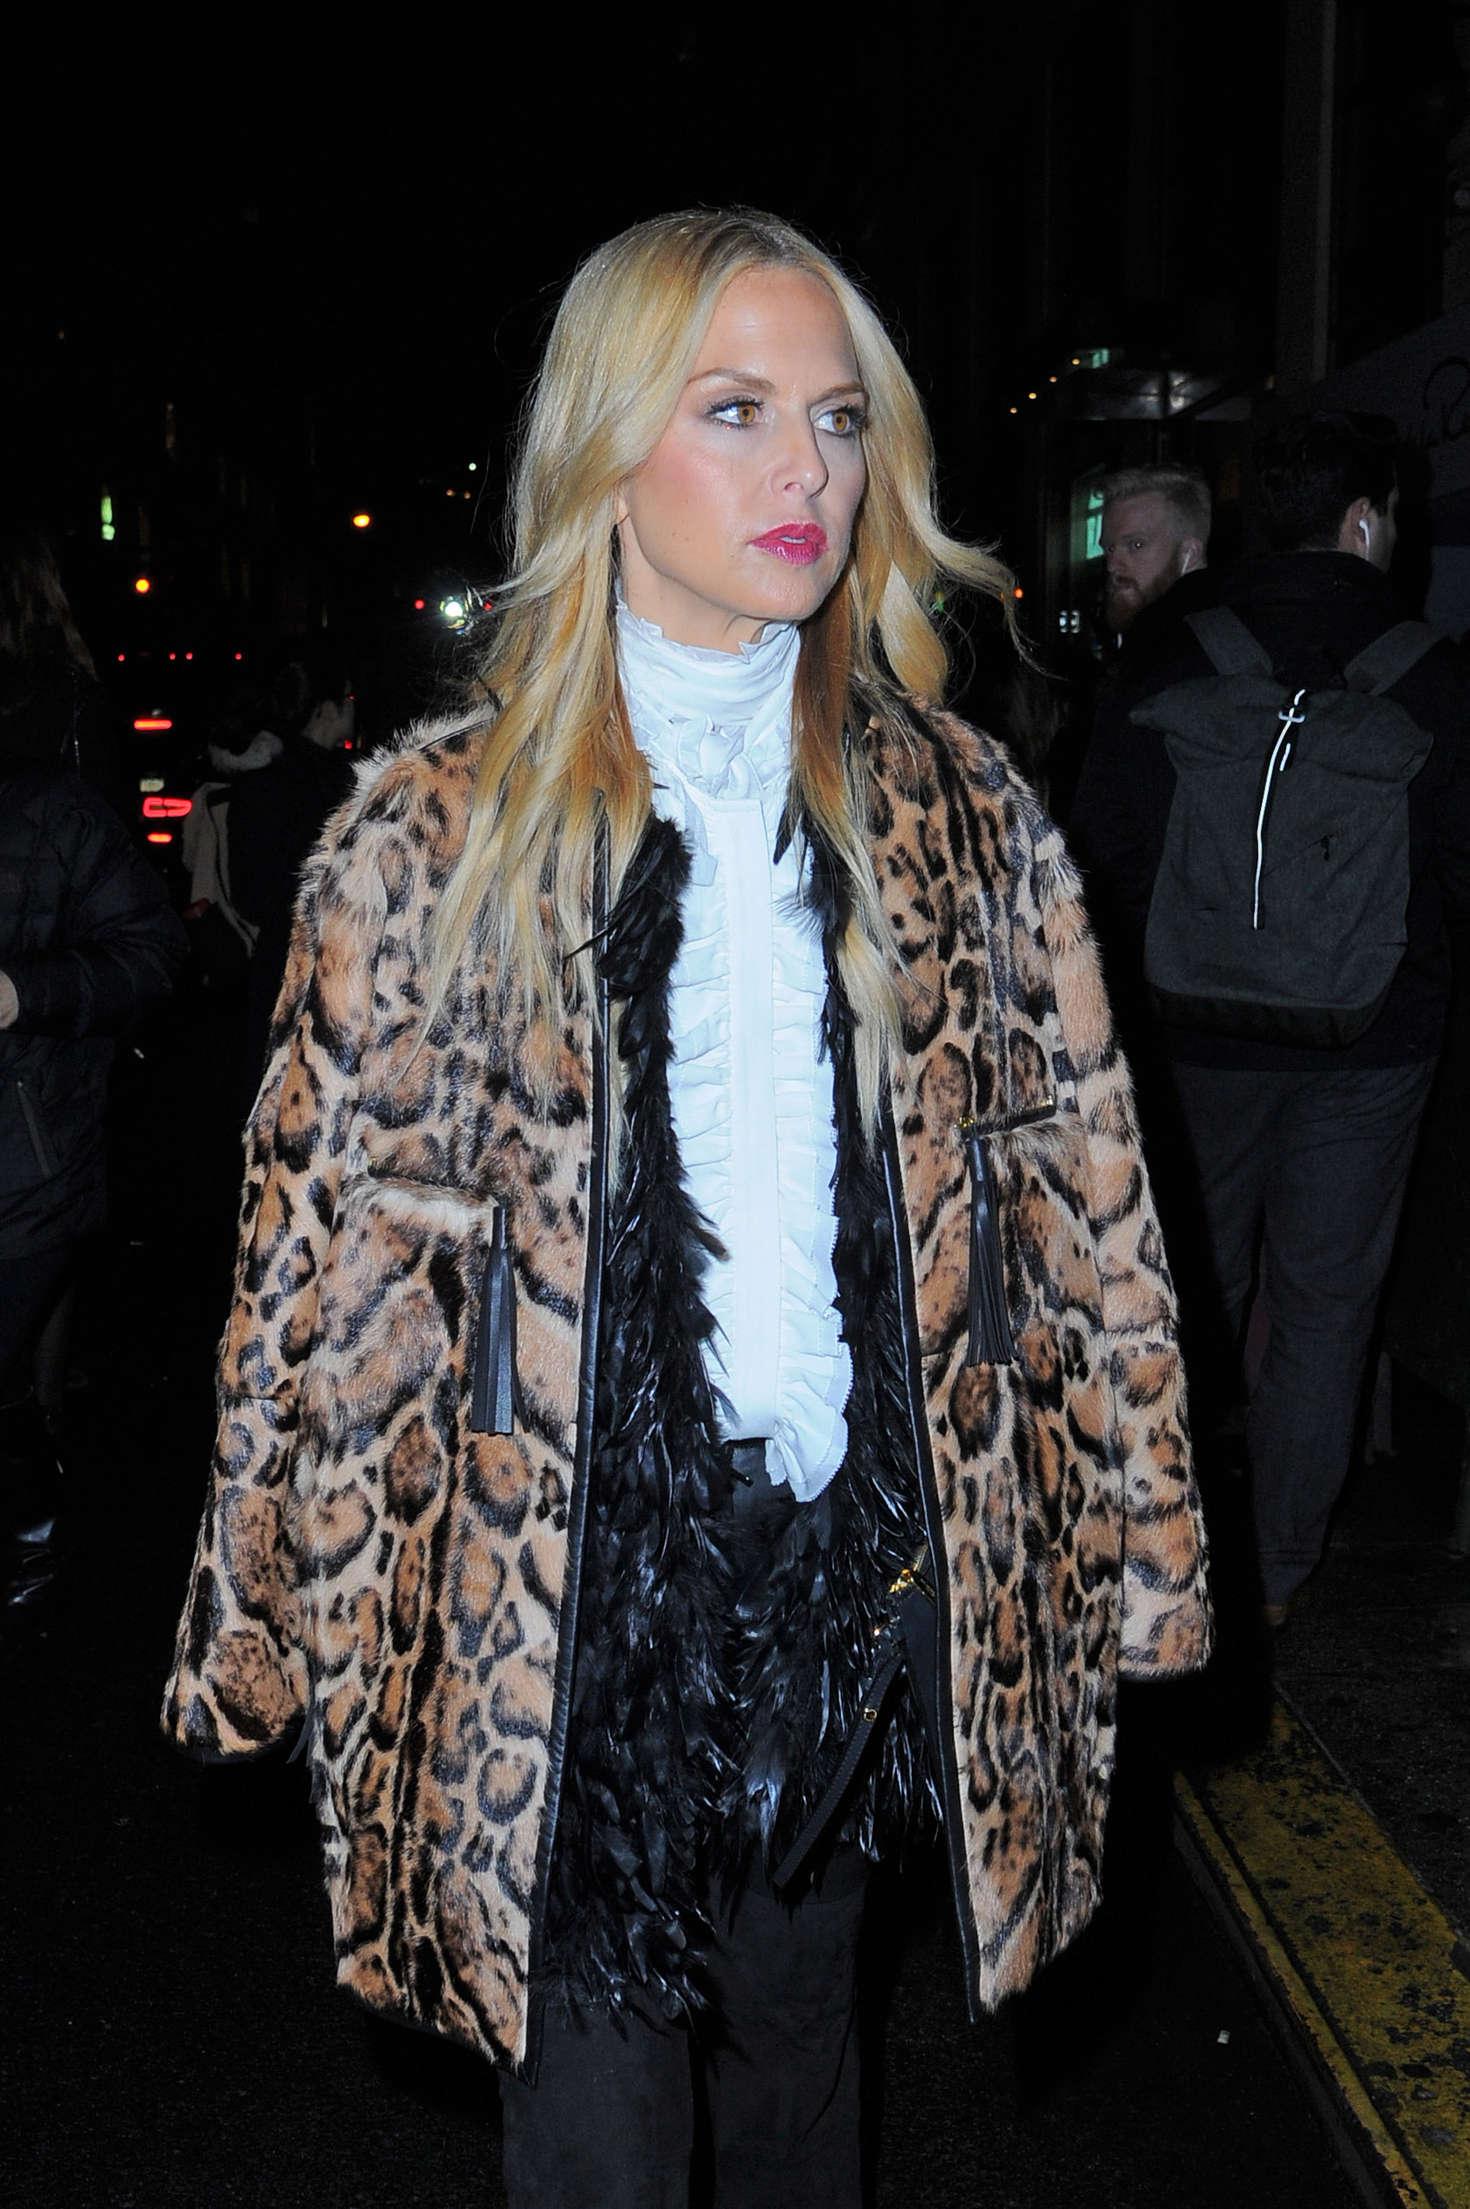 Rachel Zoe Leaving Oscar de la Renta Fashion Show in New York